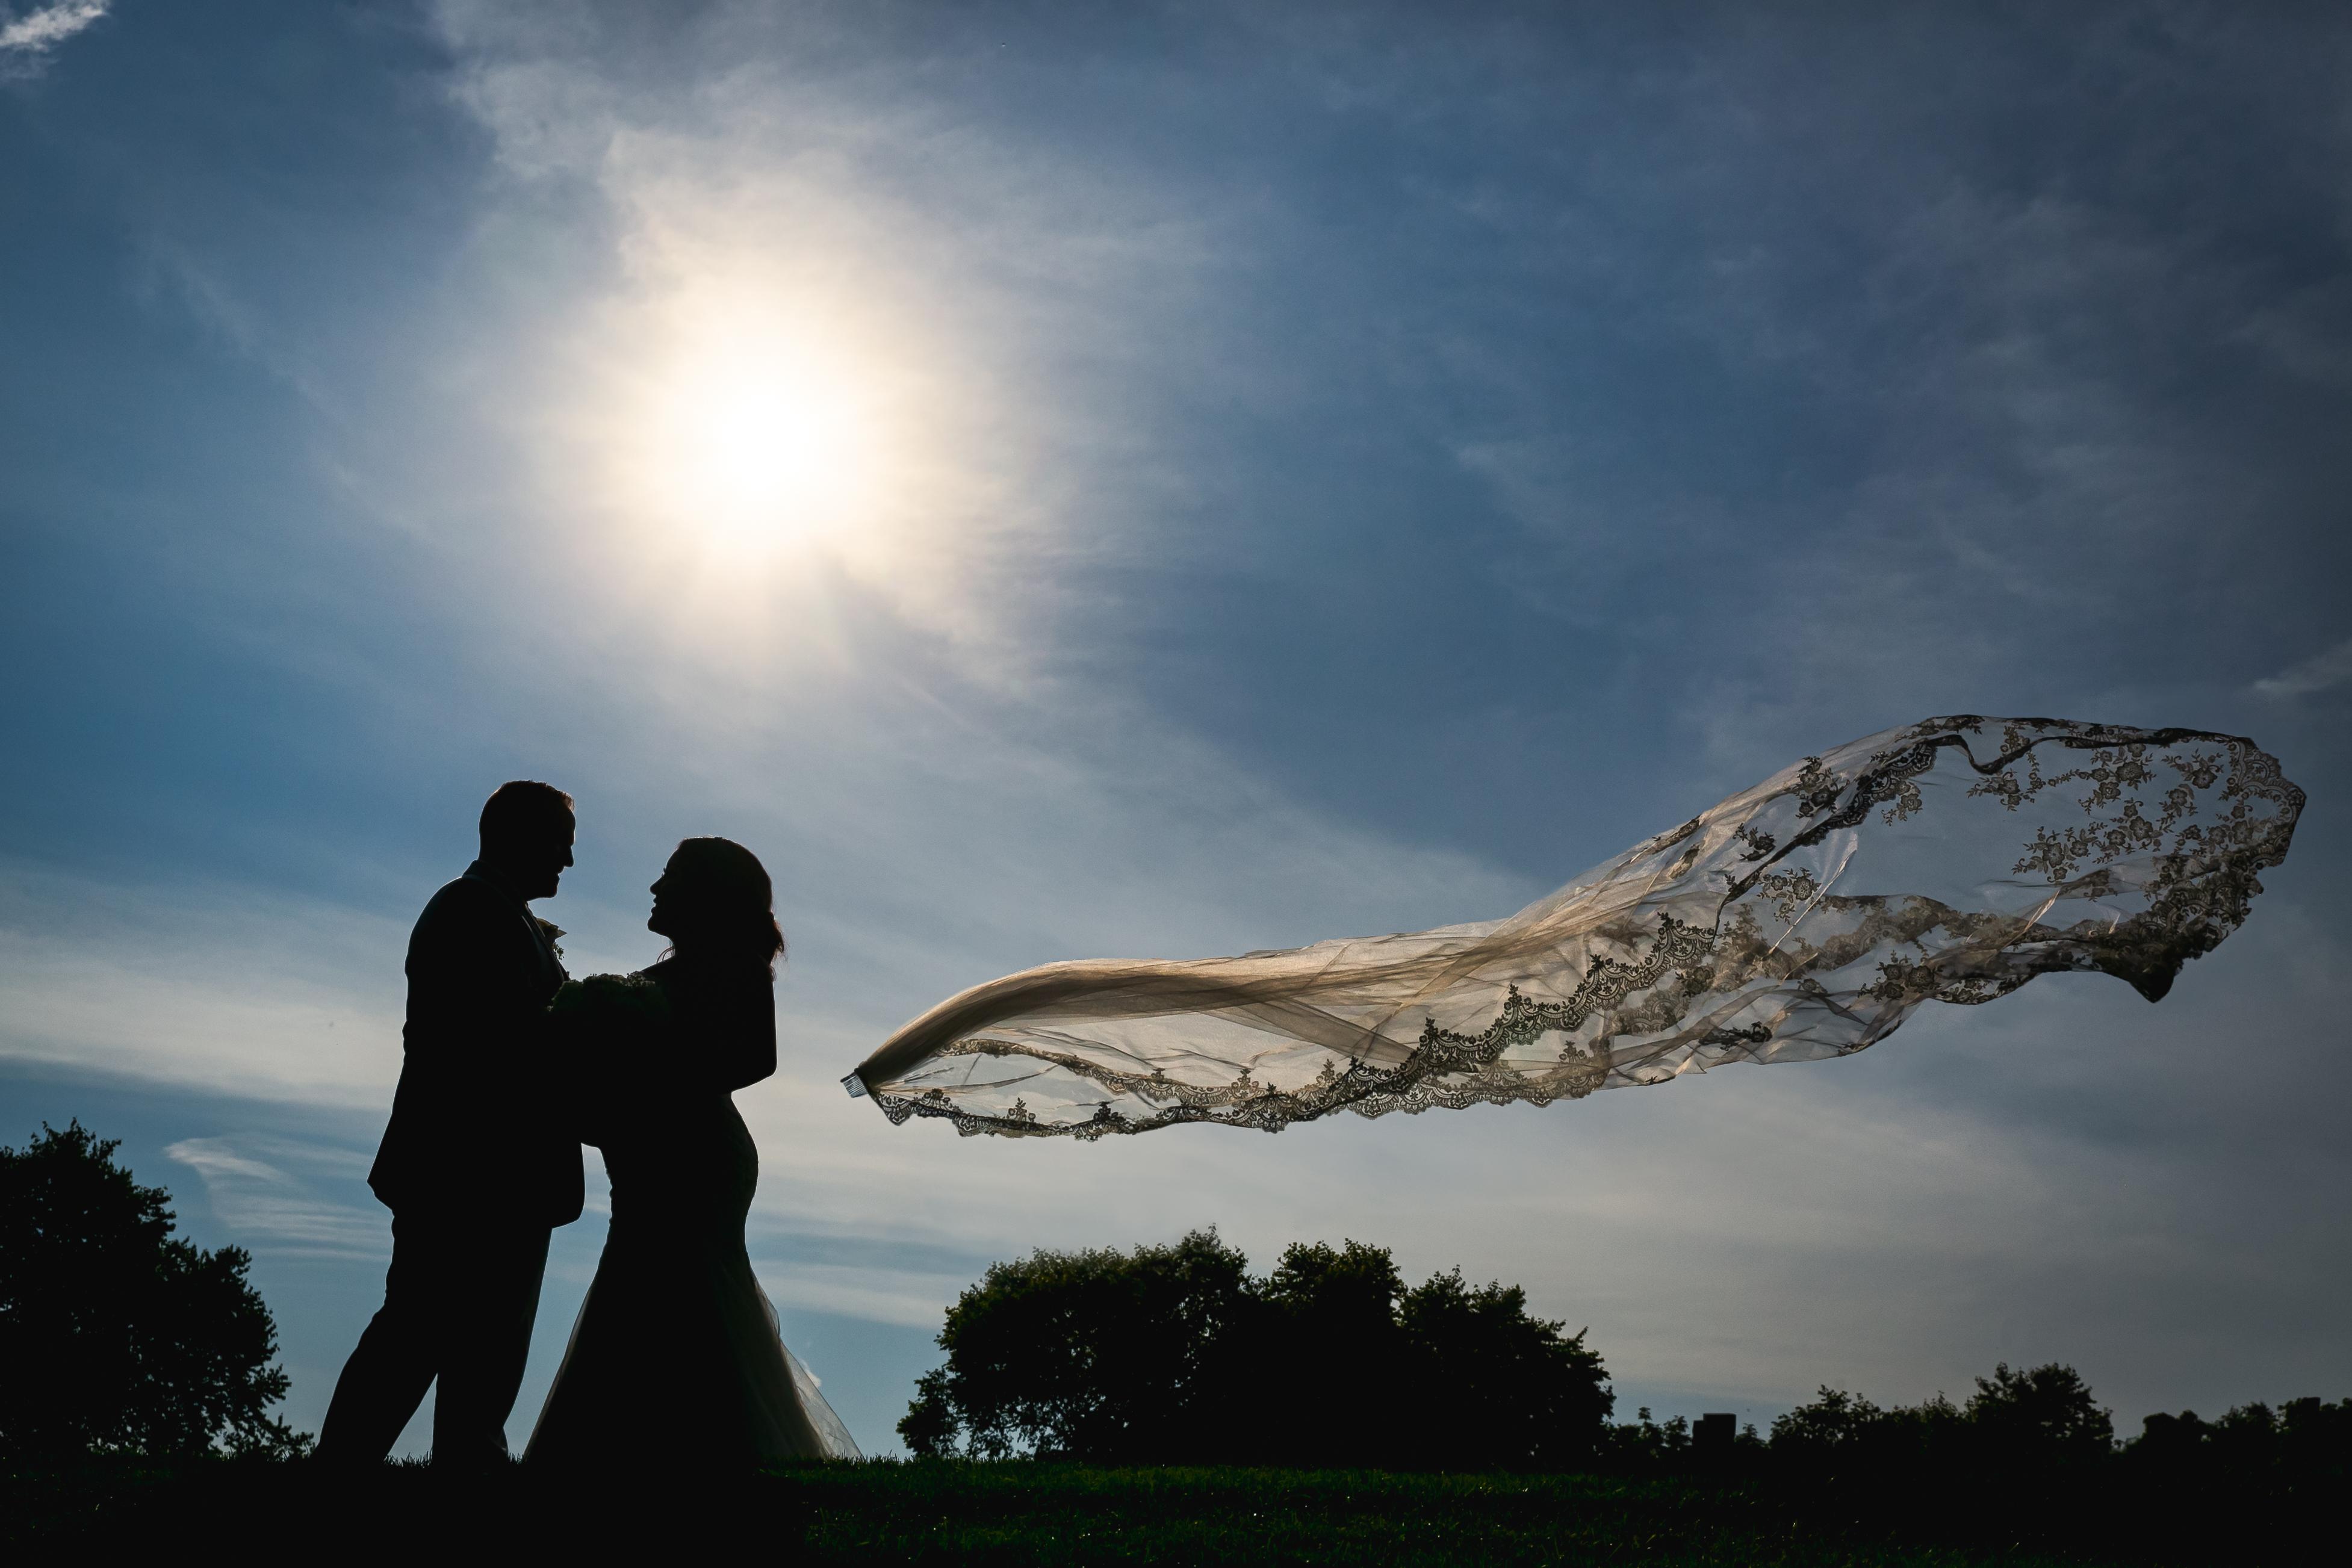 Veils Blows off the Bride's Head